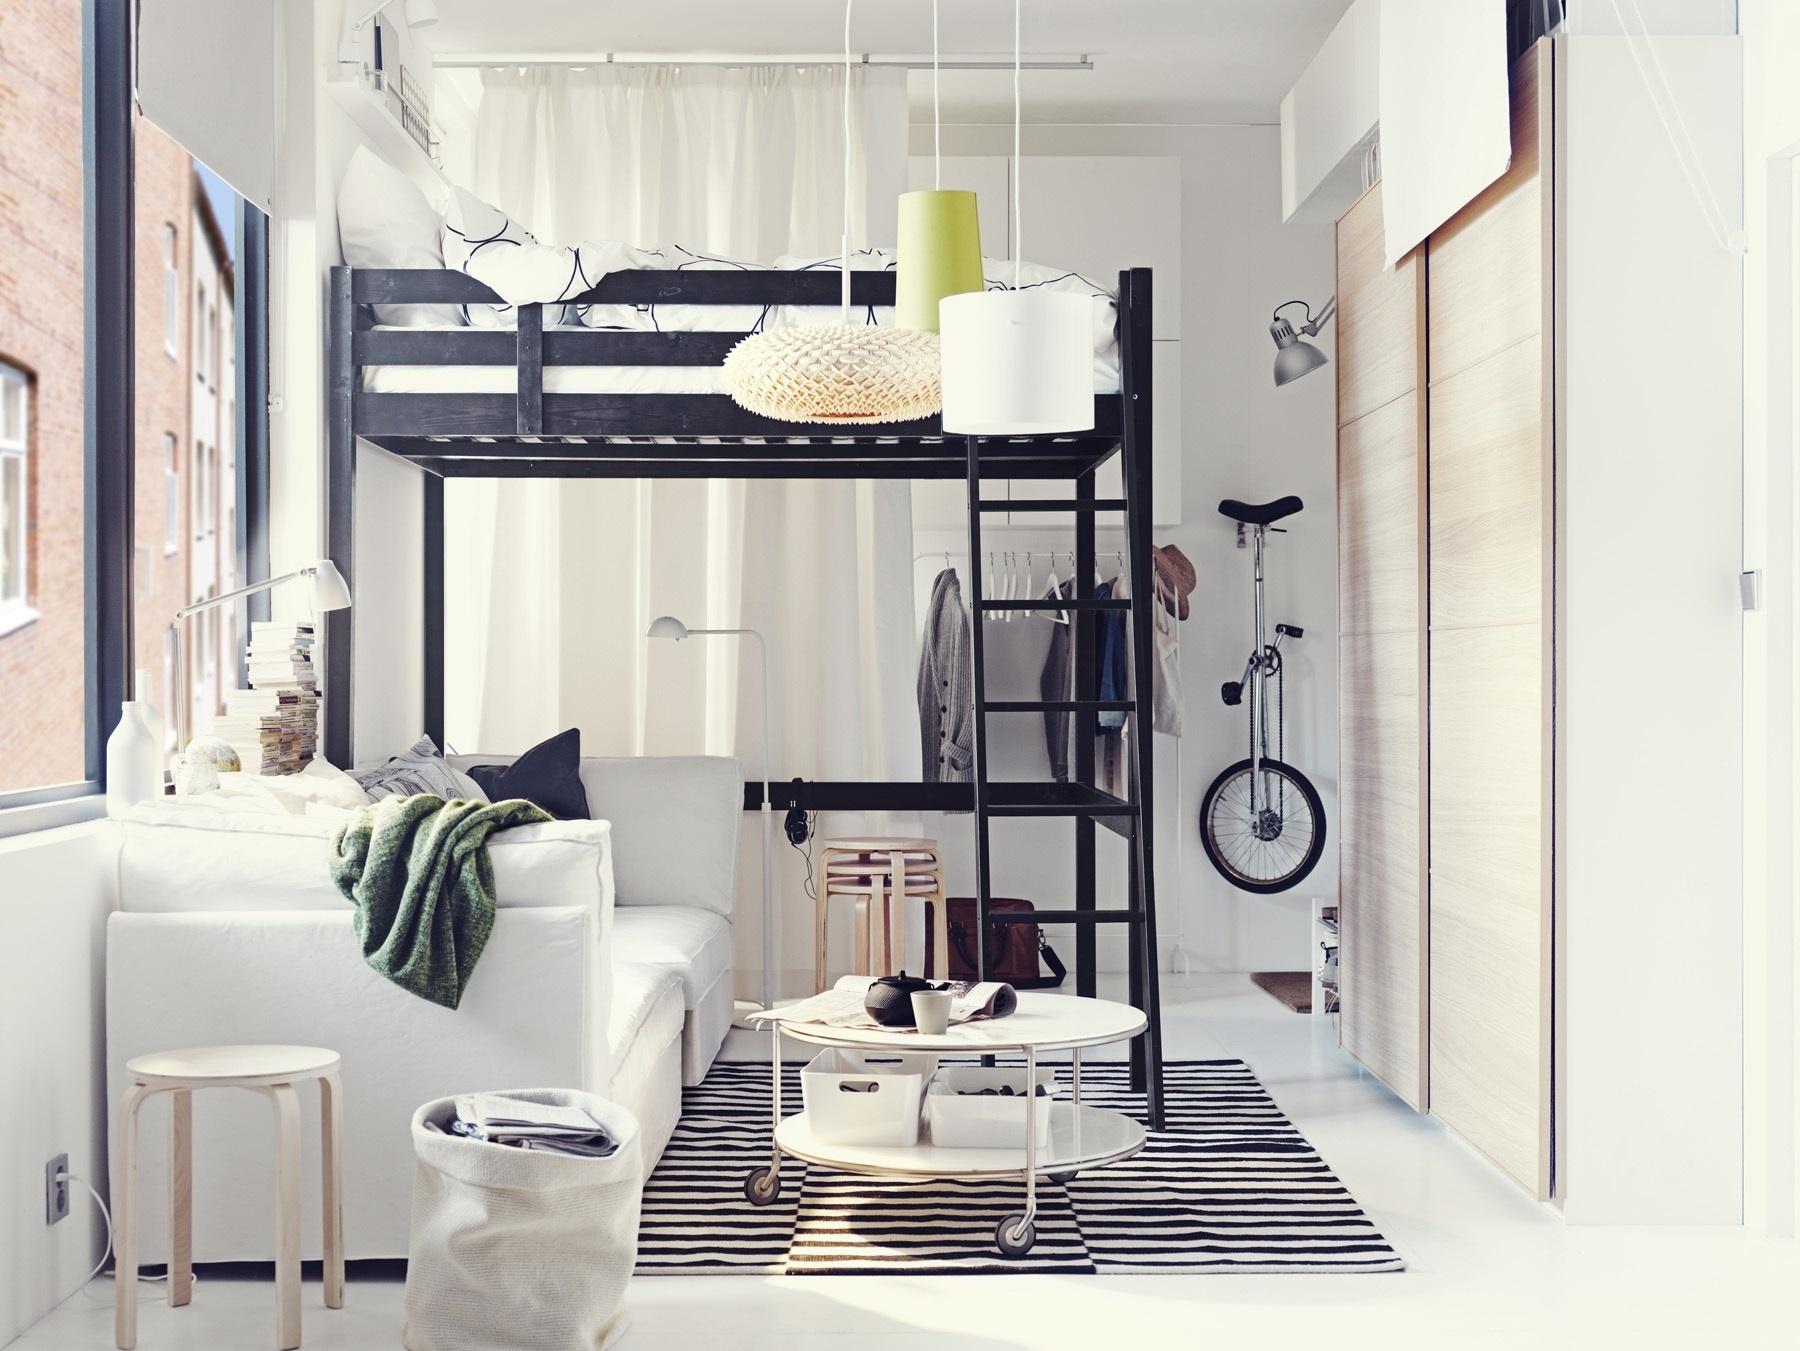 Inspirierend Teenager Zimmer Deko Selber Machen Ideen